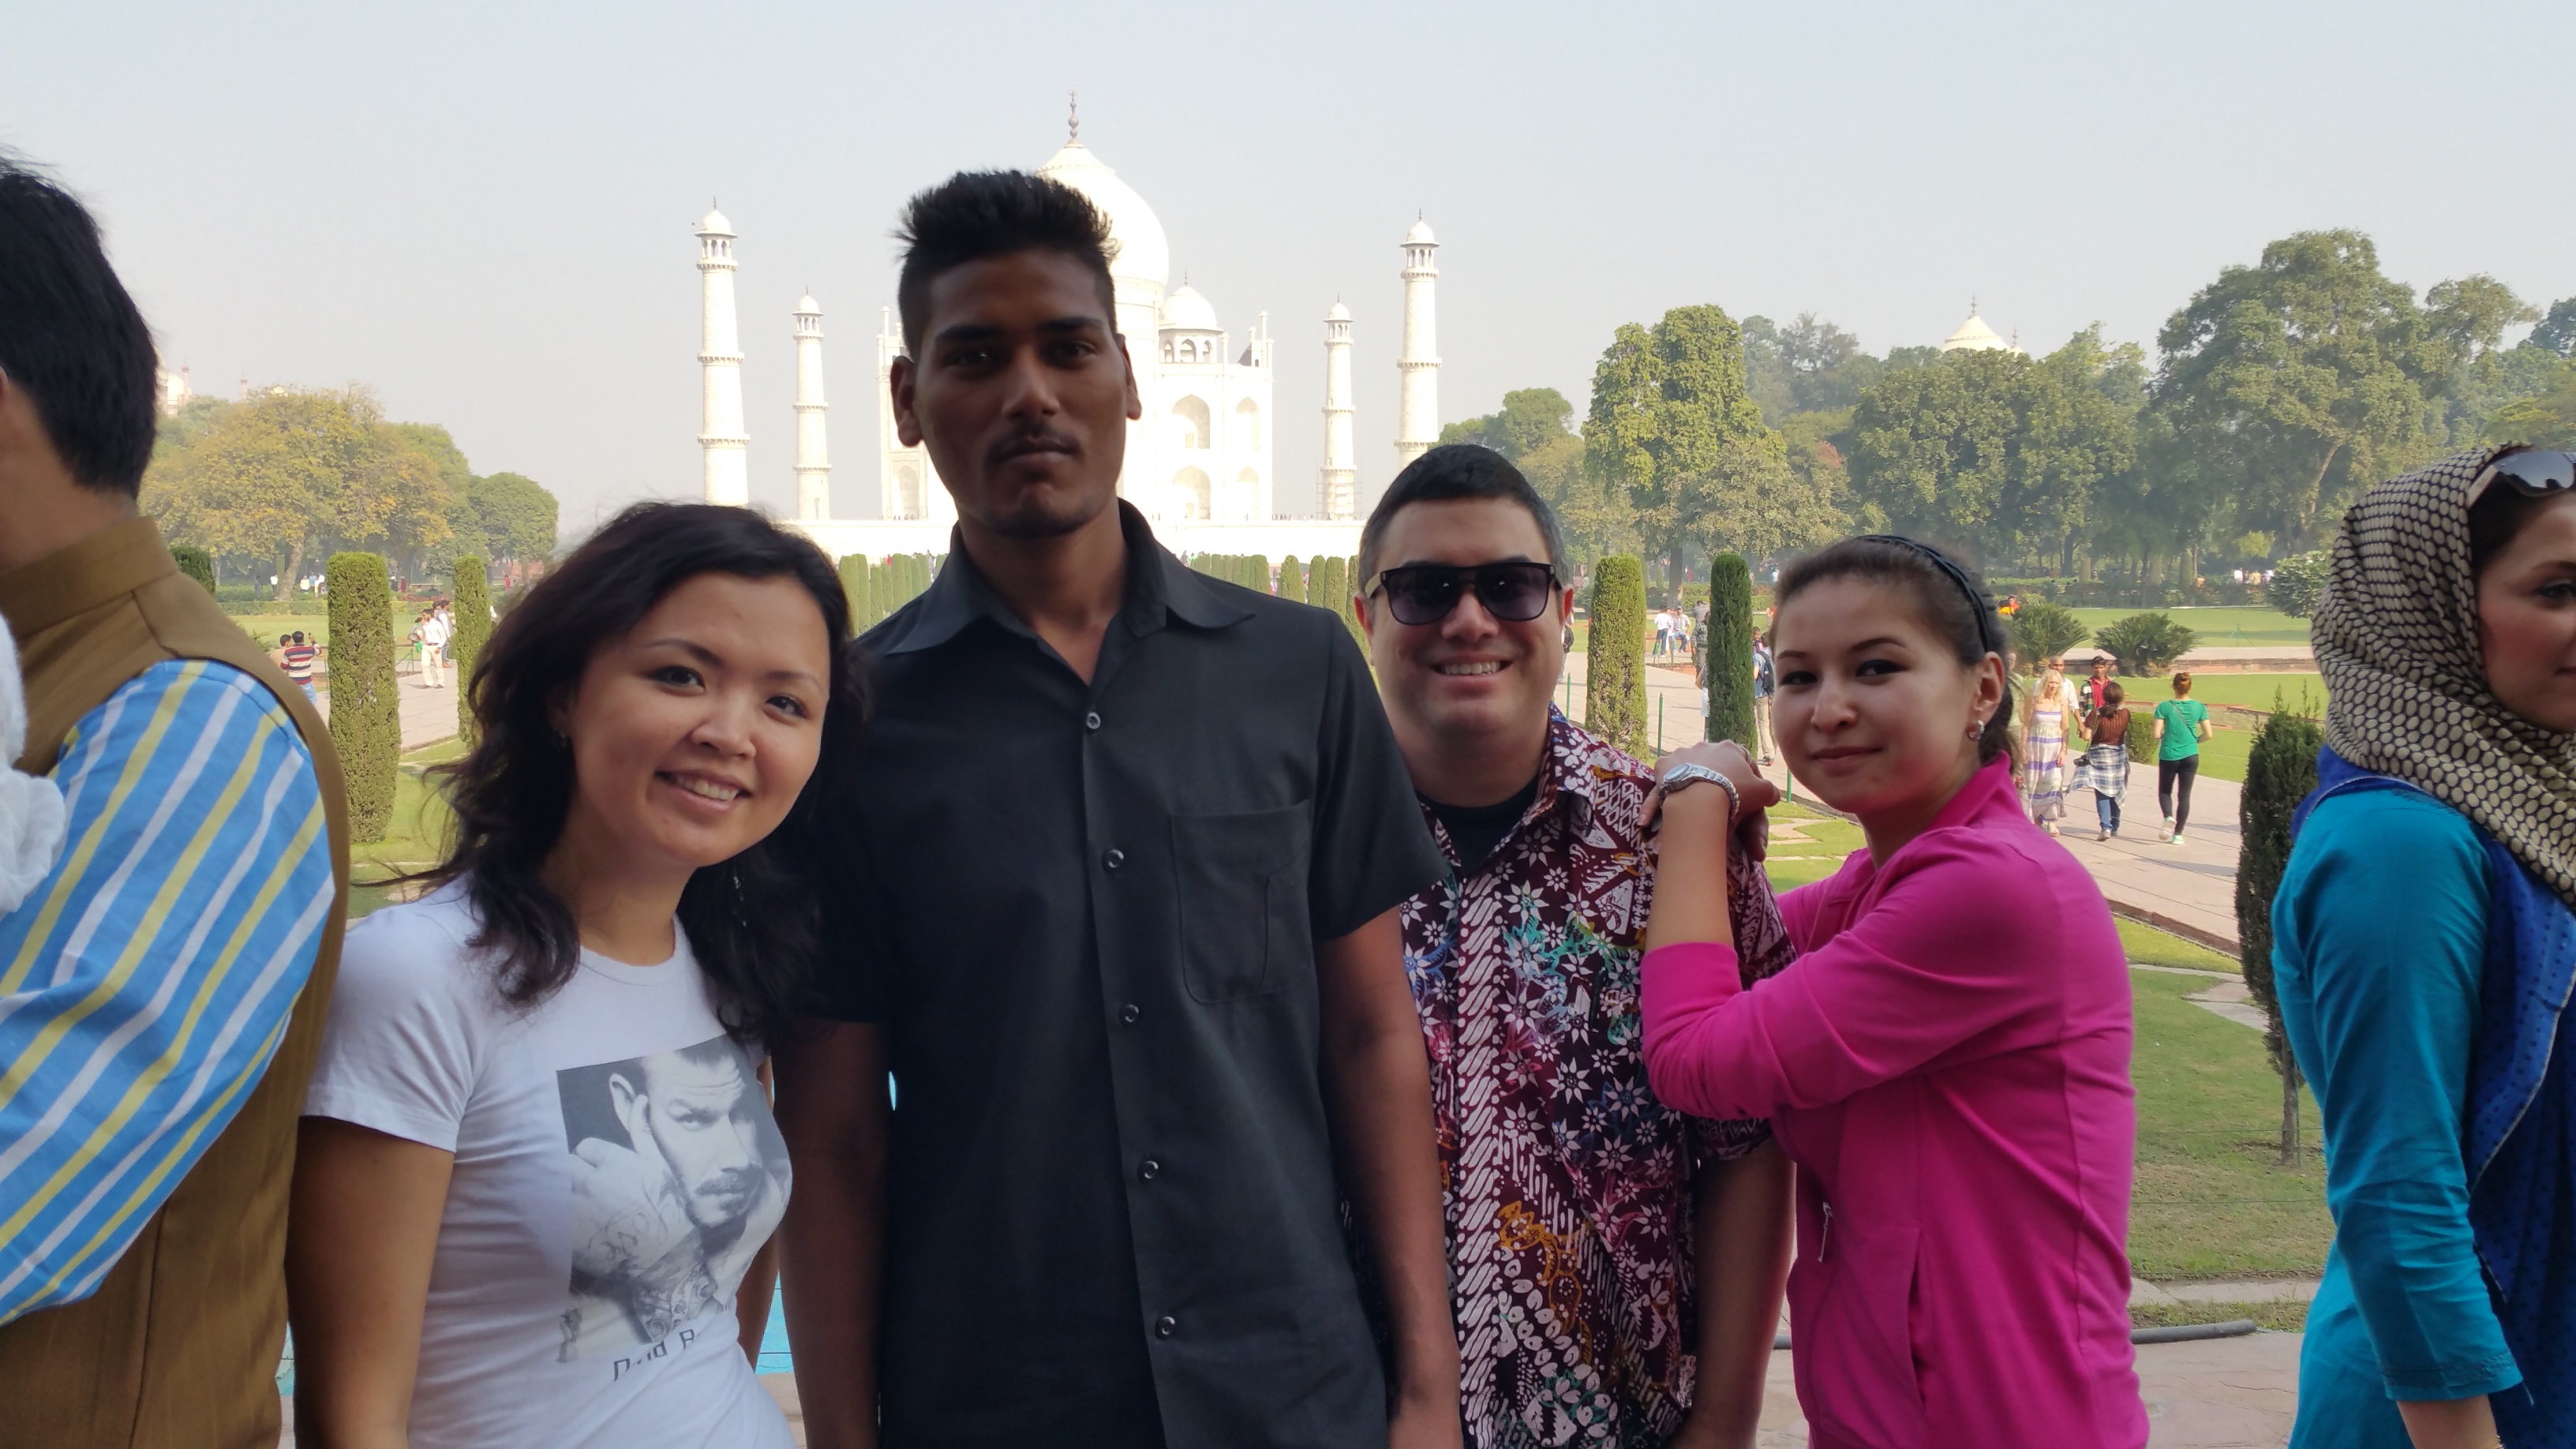 Zarina, our driver, Kevin and Aida at the Taj Mahal, Agra, India.